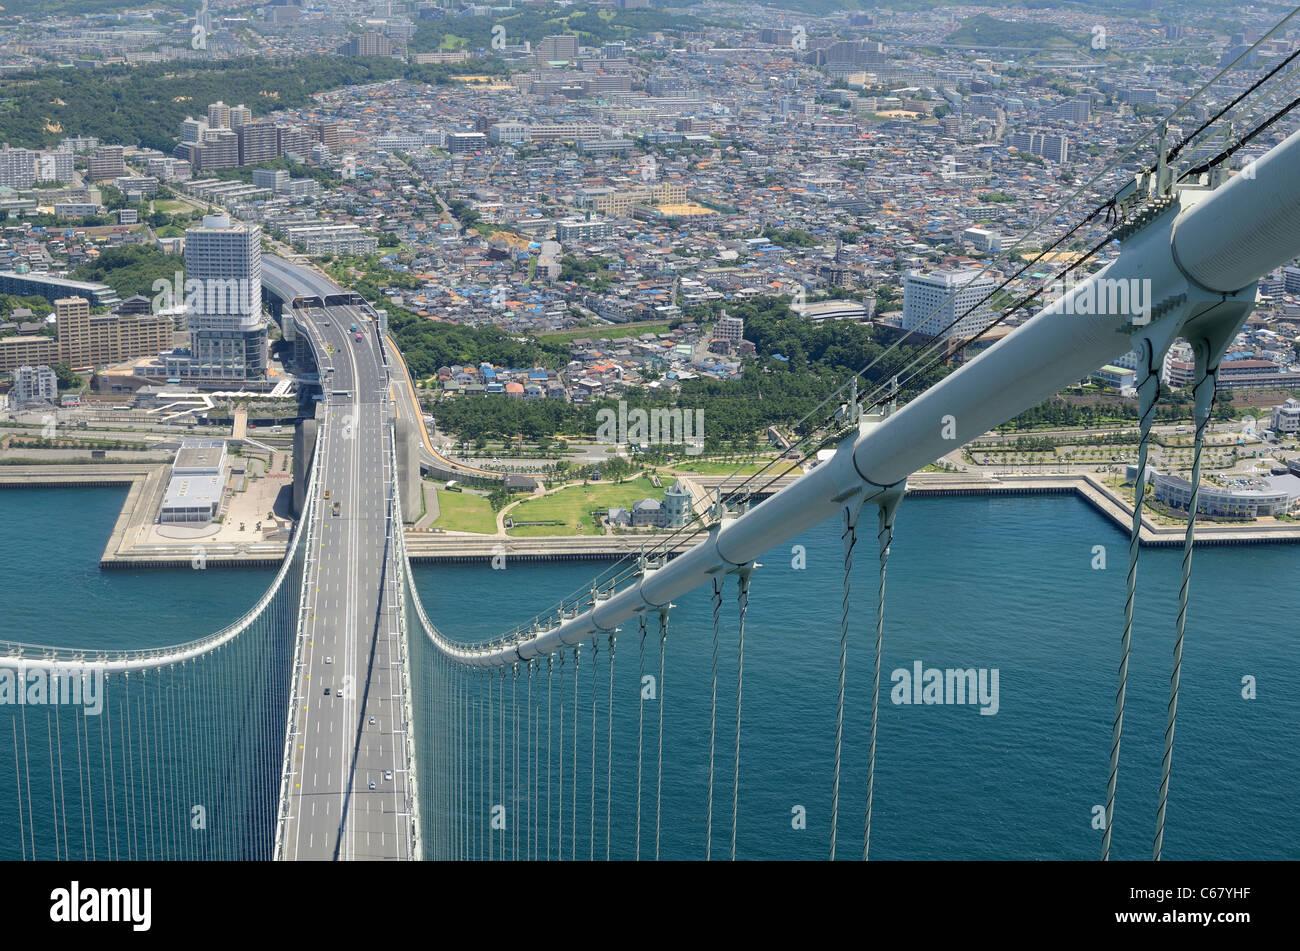 Cable of Akashi Kaikyo Bridge and Kobe City, Japan. - Stock Image